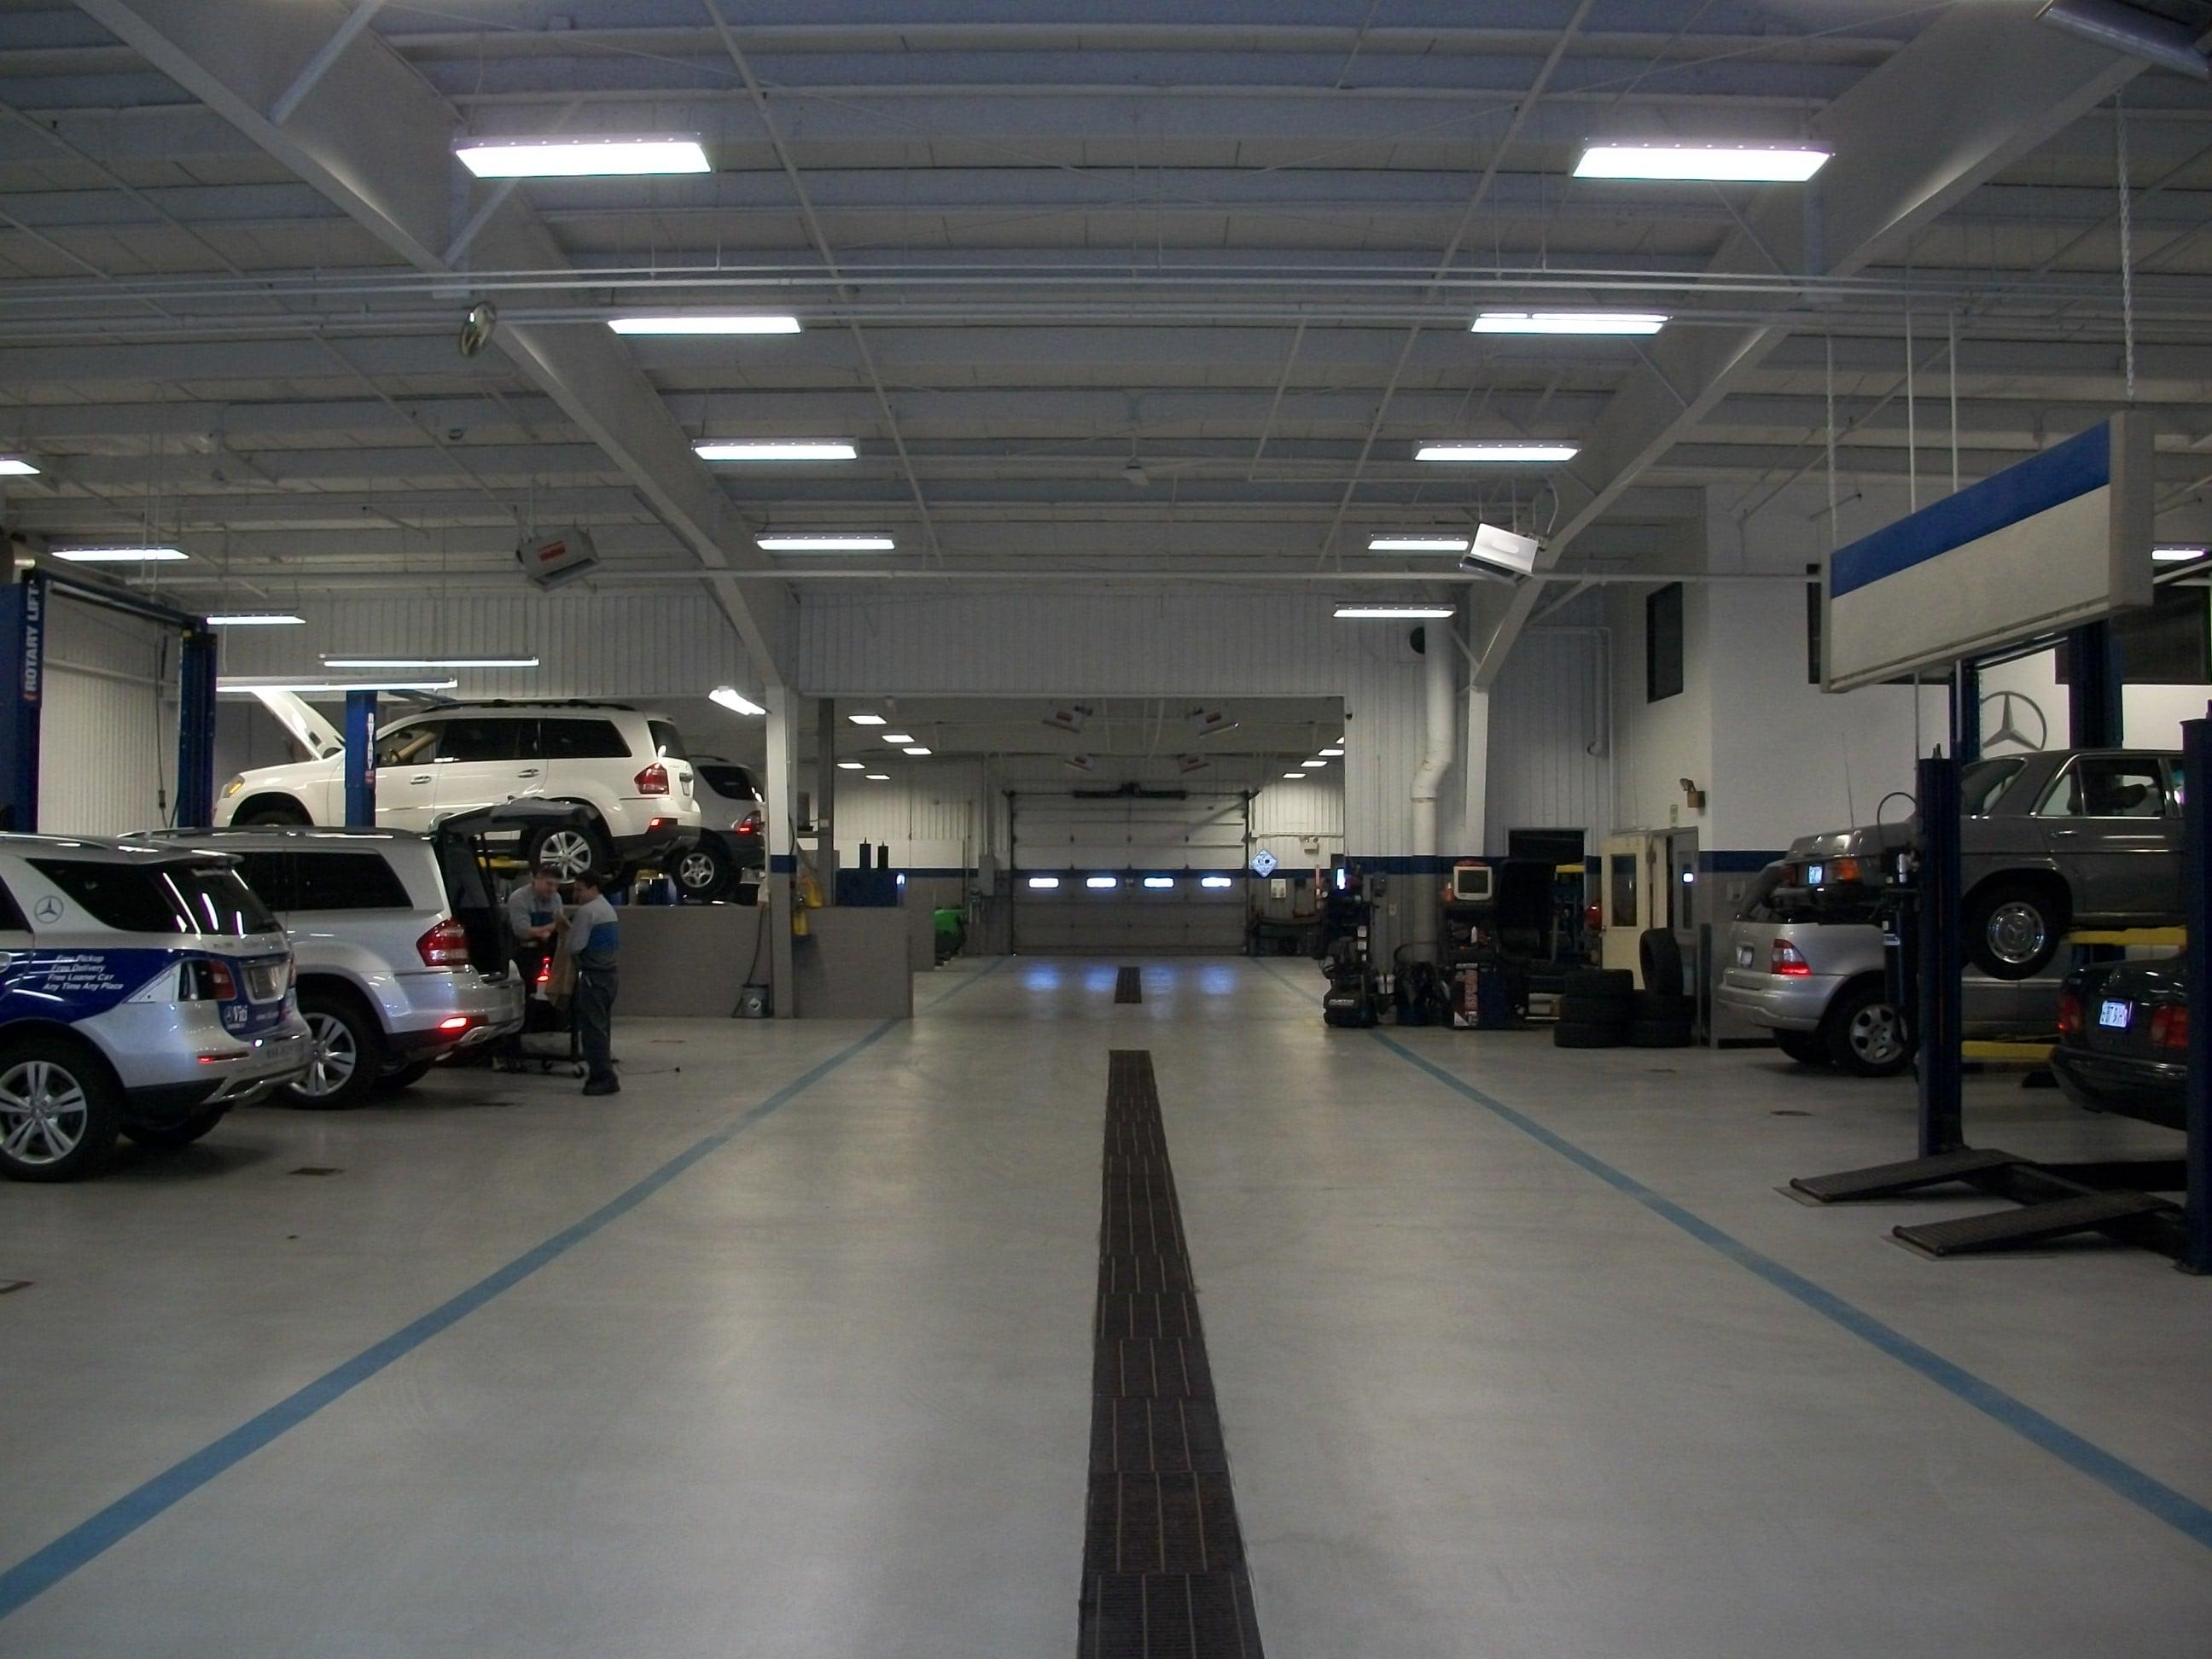 Ri mercedes benz service at viti serving tiverton and for Mercedes benz bridgewater service